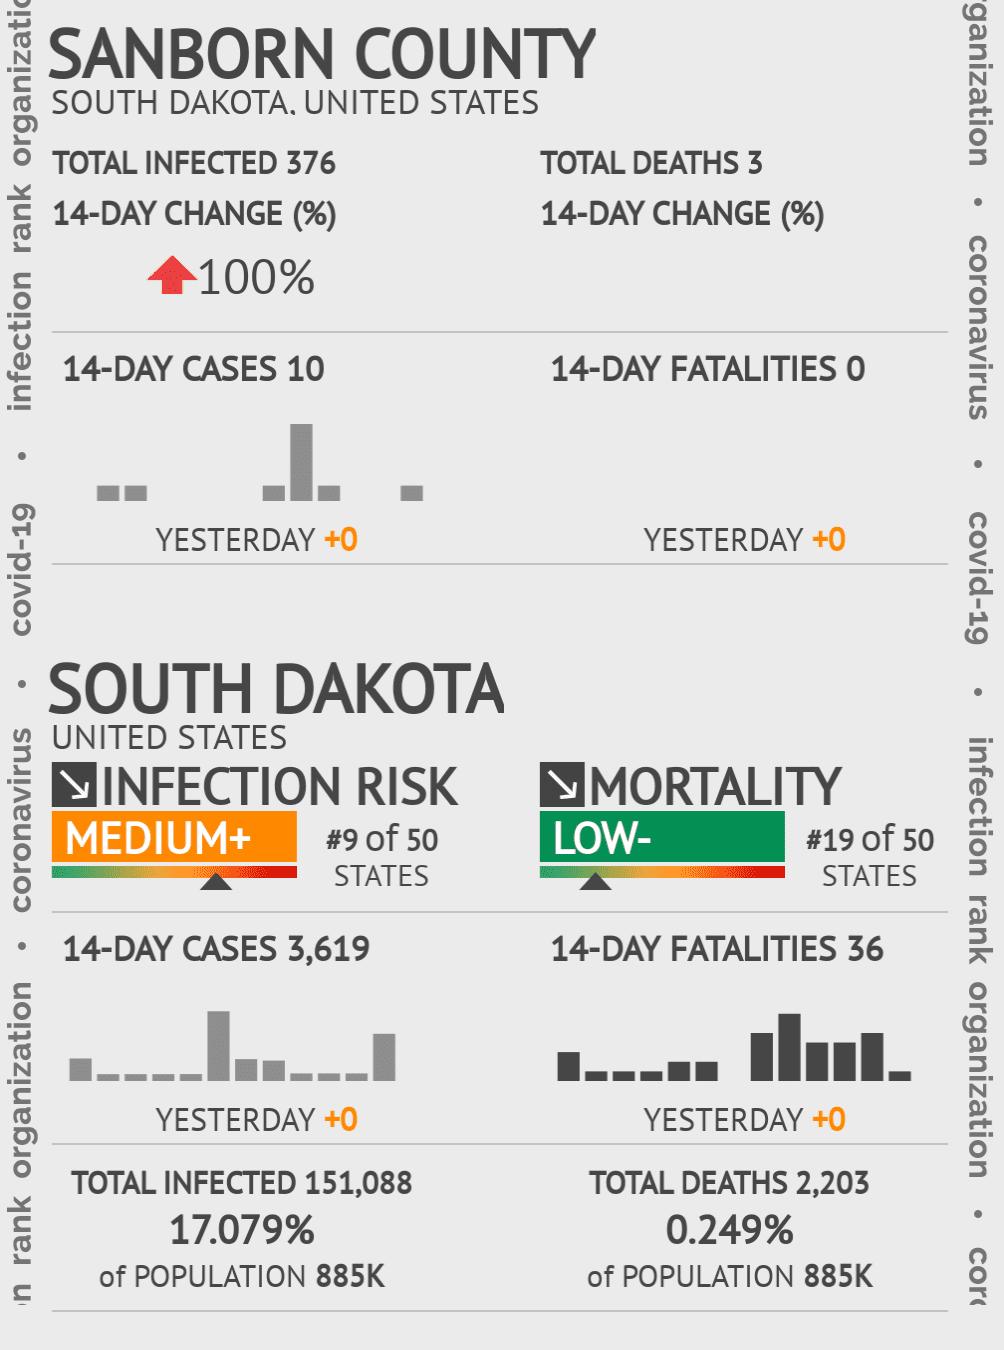 Sanborn County Coronavirus Covid-19 Risk of Infection on February 28, 2021